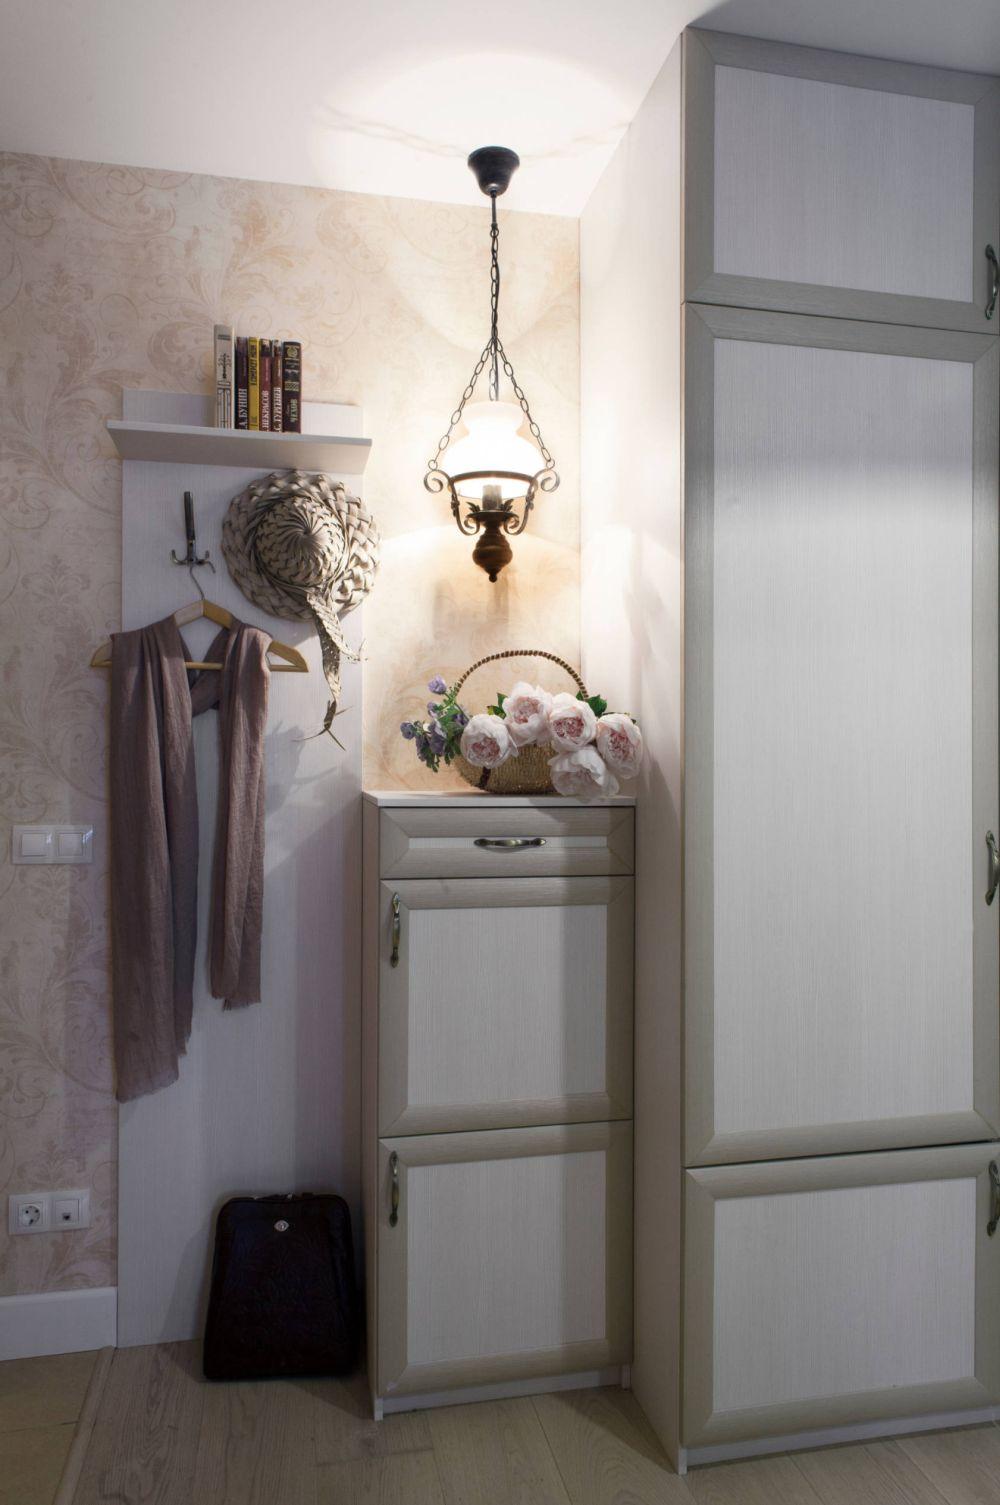 adelaparvu.com despre apartament 48 mp, stil provensal, Designer Svetlana Krasnova, Foto Natalia Kupriyanova (3)